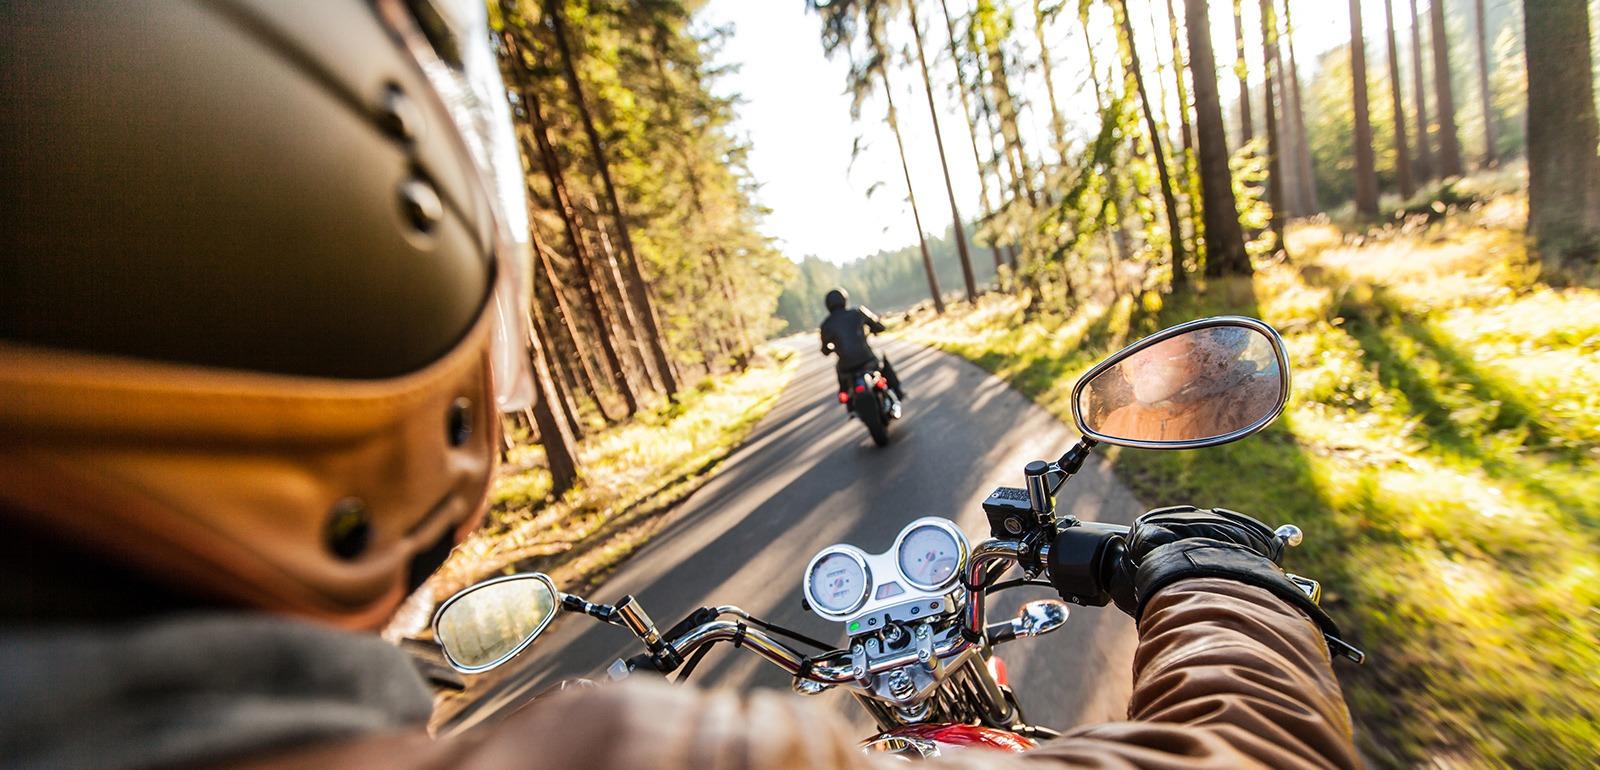 L'Orne à moto © Lukas Gojda